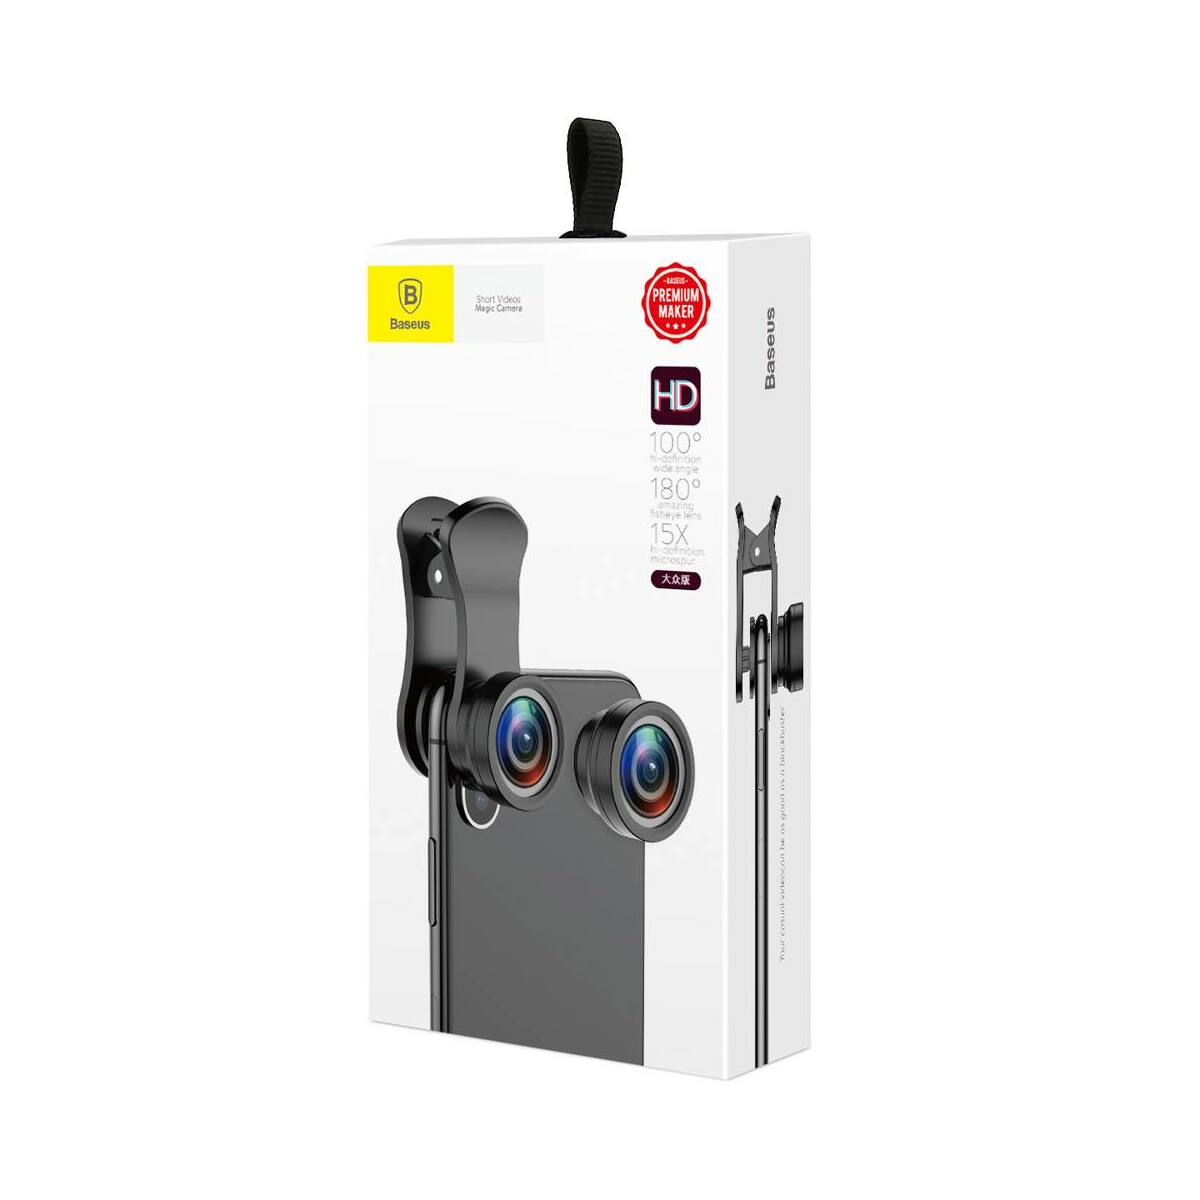 Baseus kamera optika mobilhoz Short Videos Magic (General), fekete (ACSXT-C01)